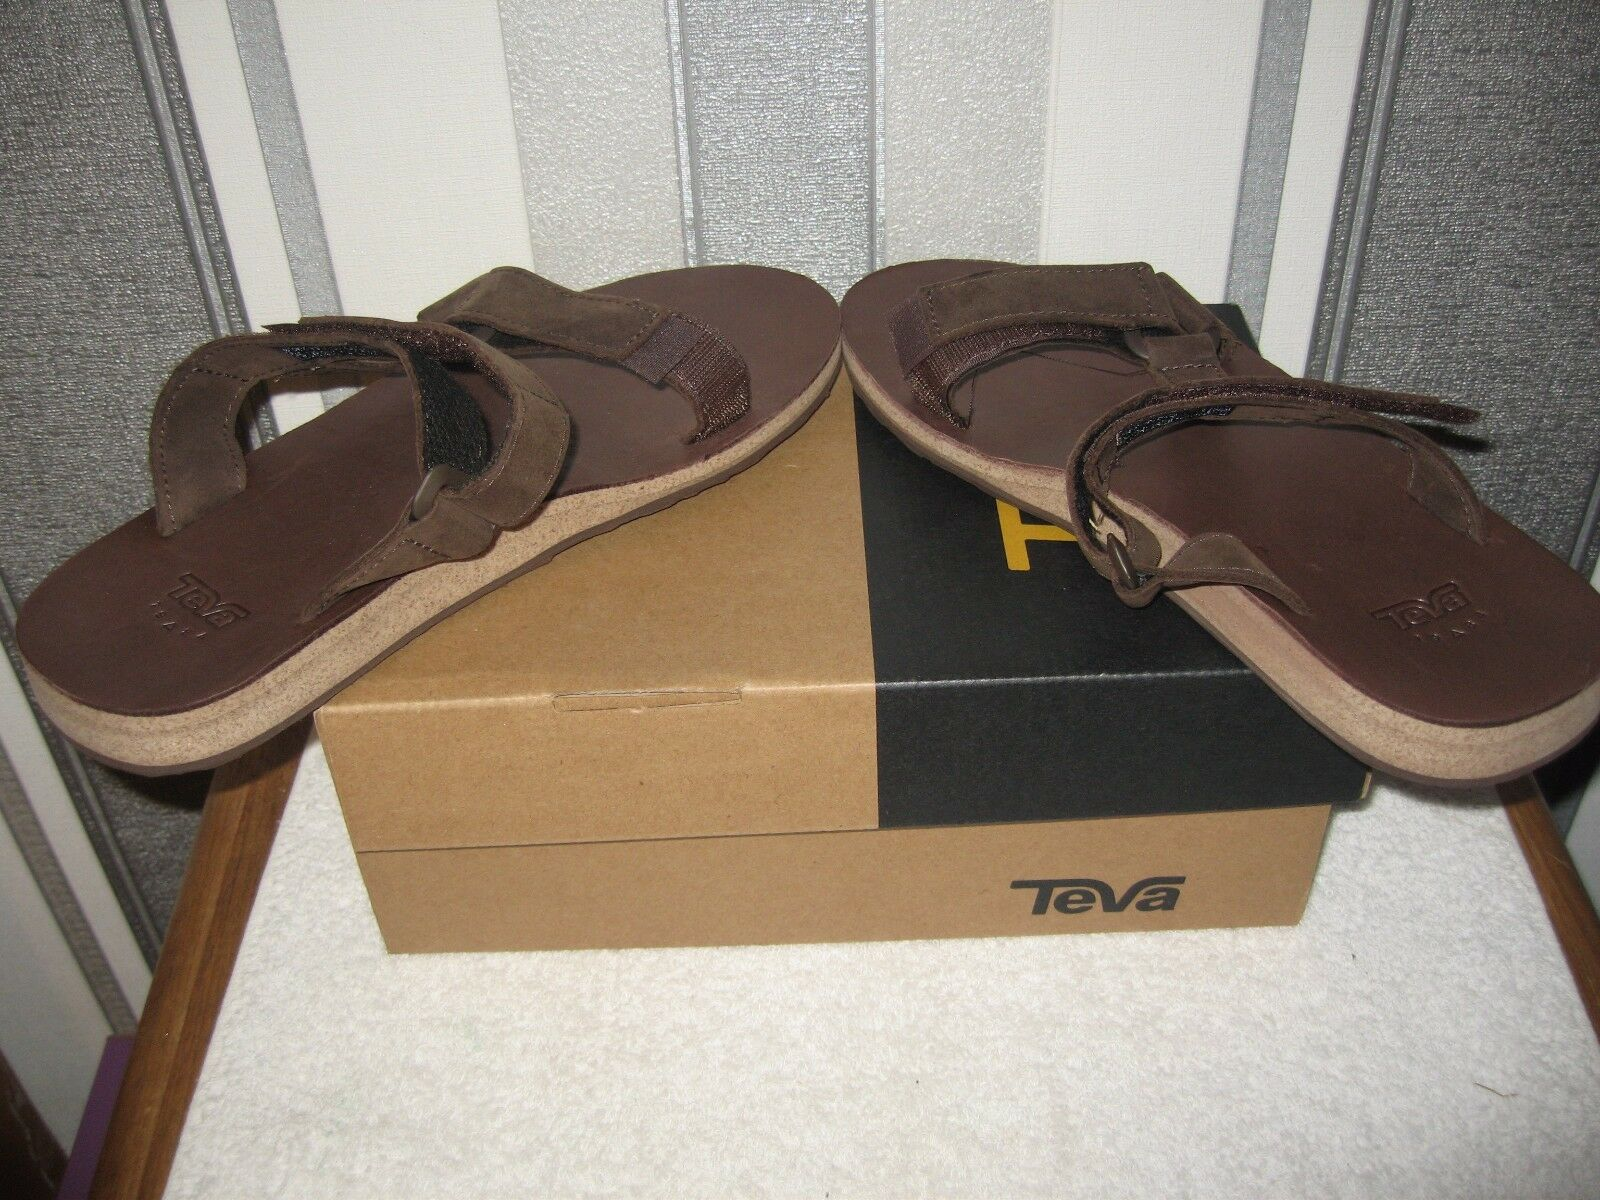 Teva Men Universal Comfort Leather Casual Slide 11 Sandals Brown uk size 11 Slide or 7 c0c6e3